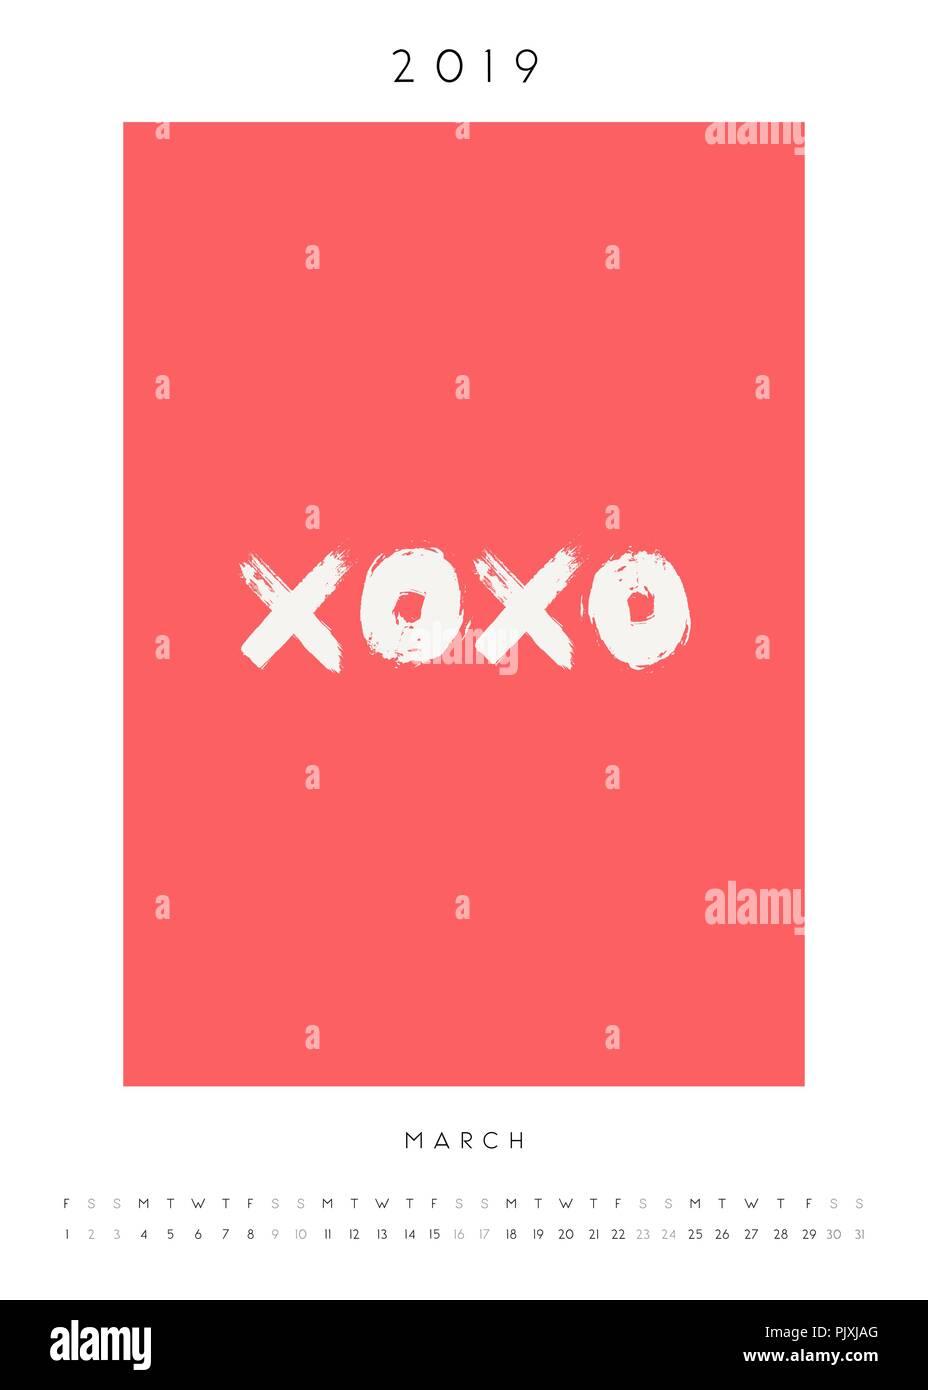 Printable A4 Size March 2019 Calendar Template Hand Drawn Symbols